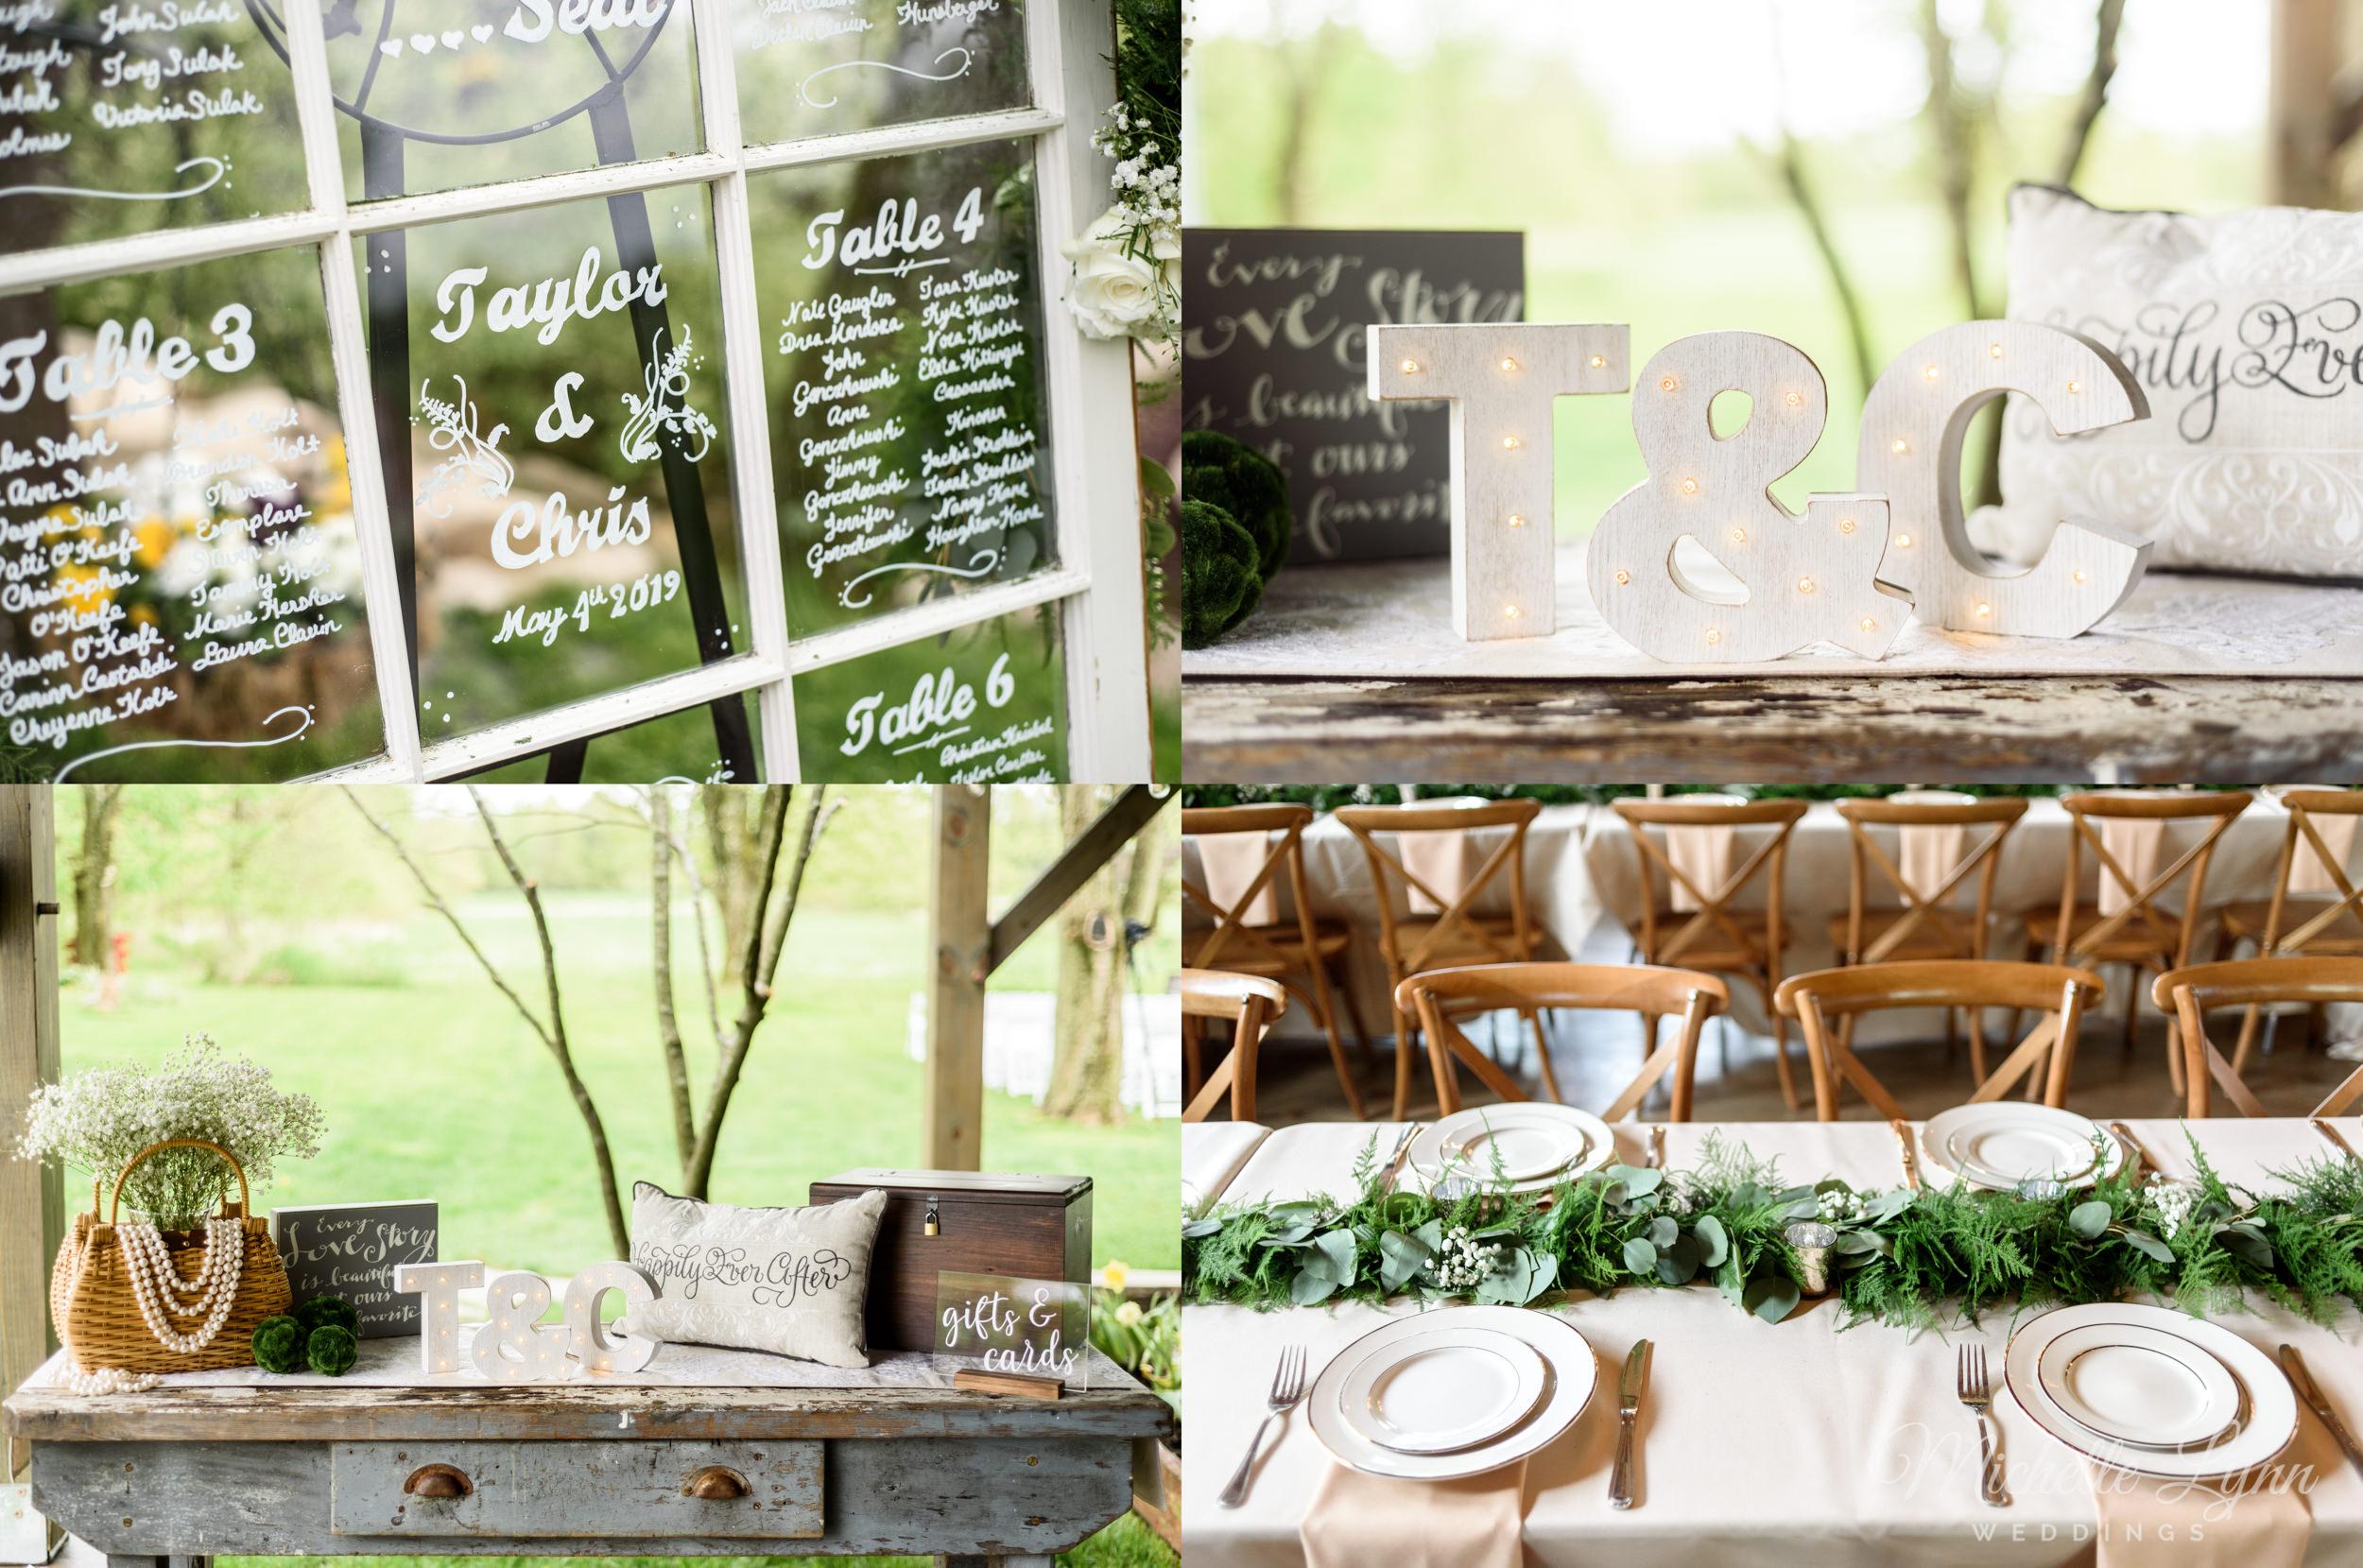 mlw-the-farm-bakery-and-events-wedding-photos-59.jpg